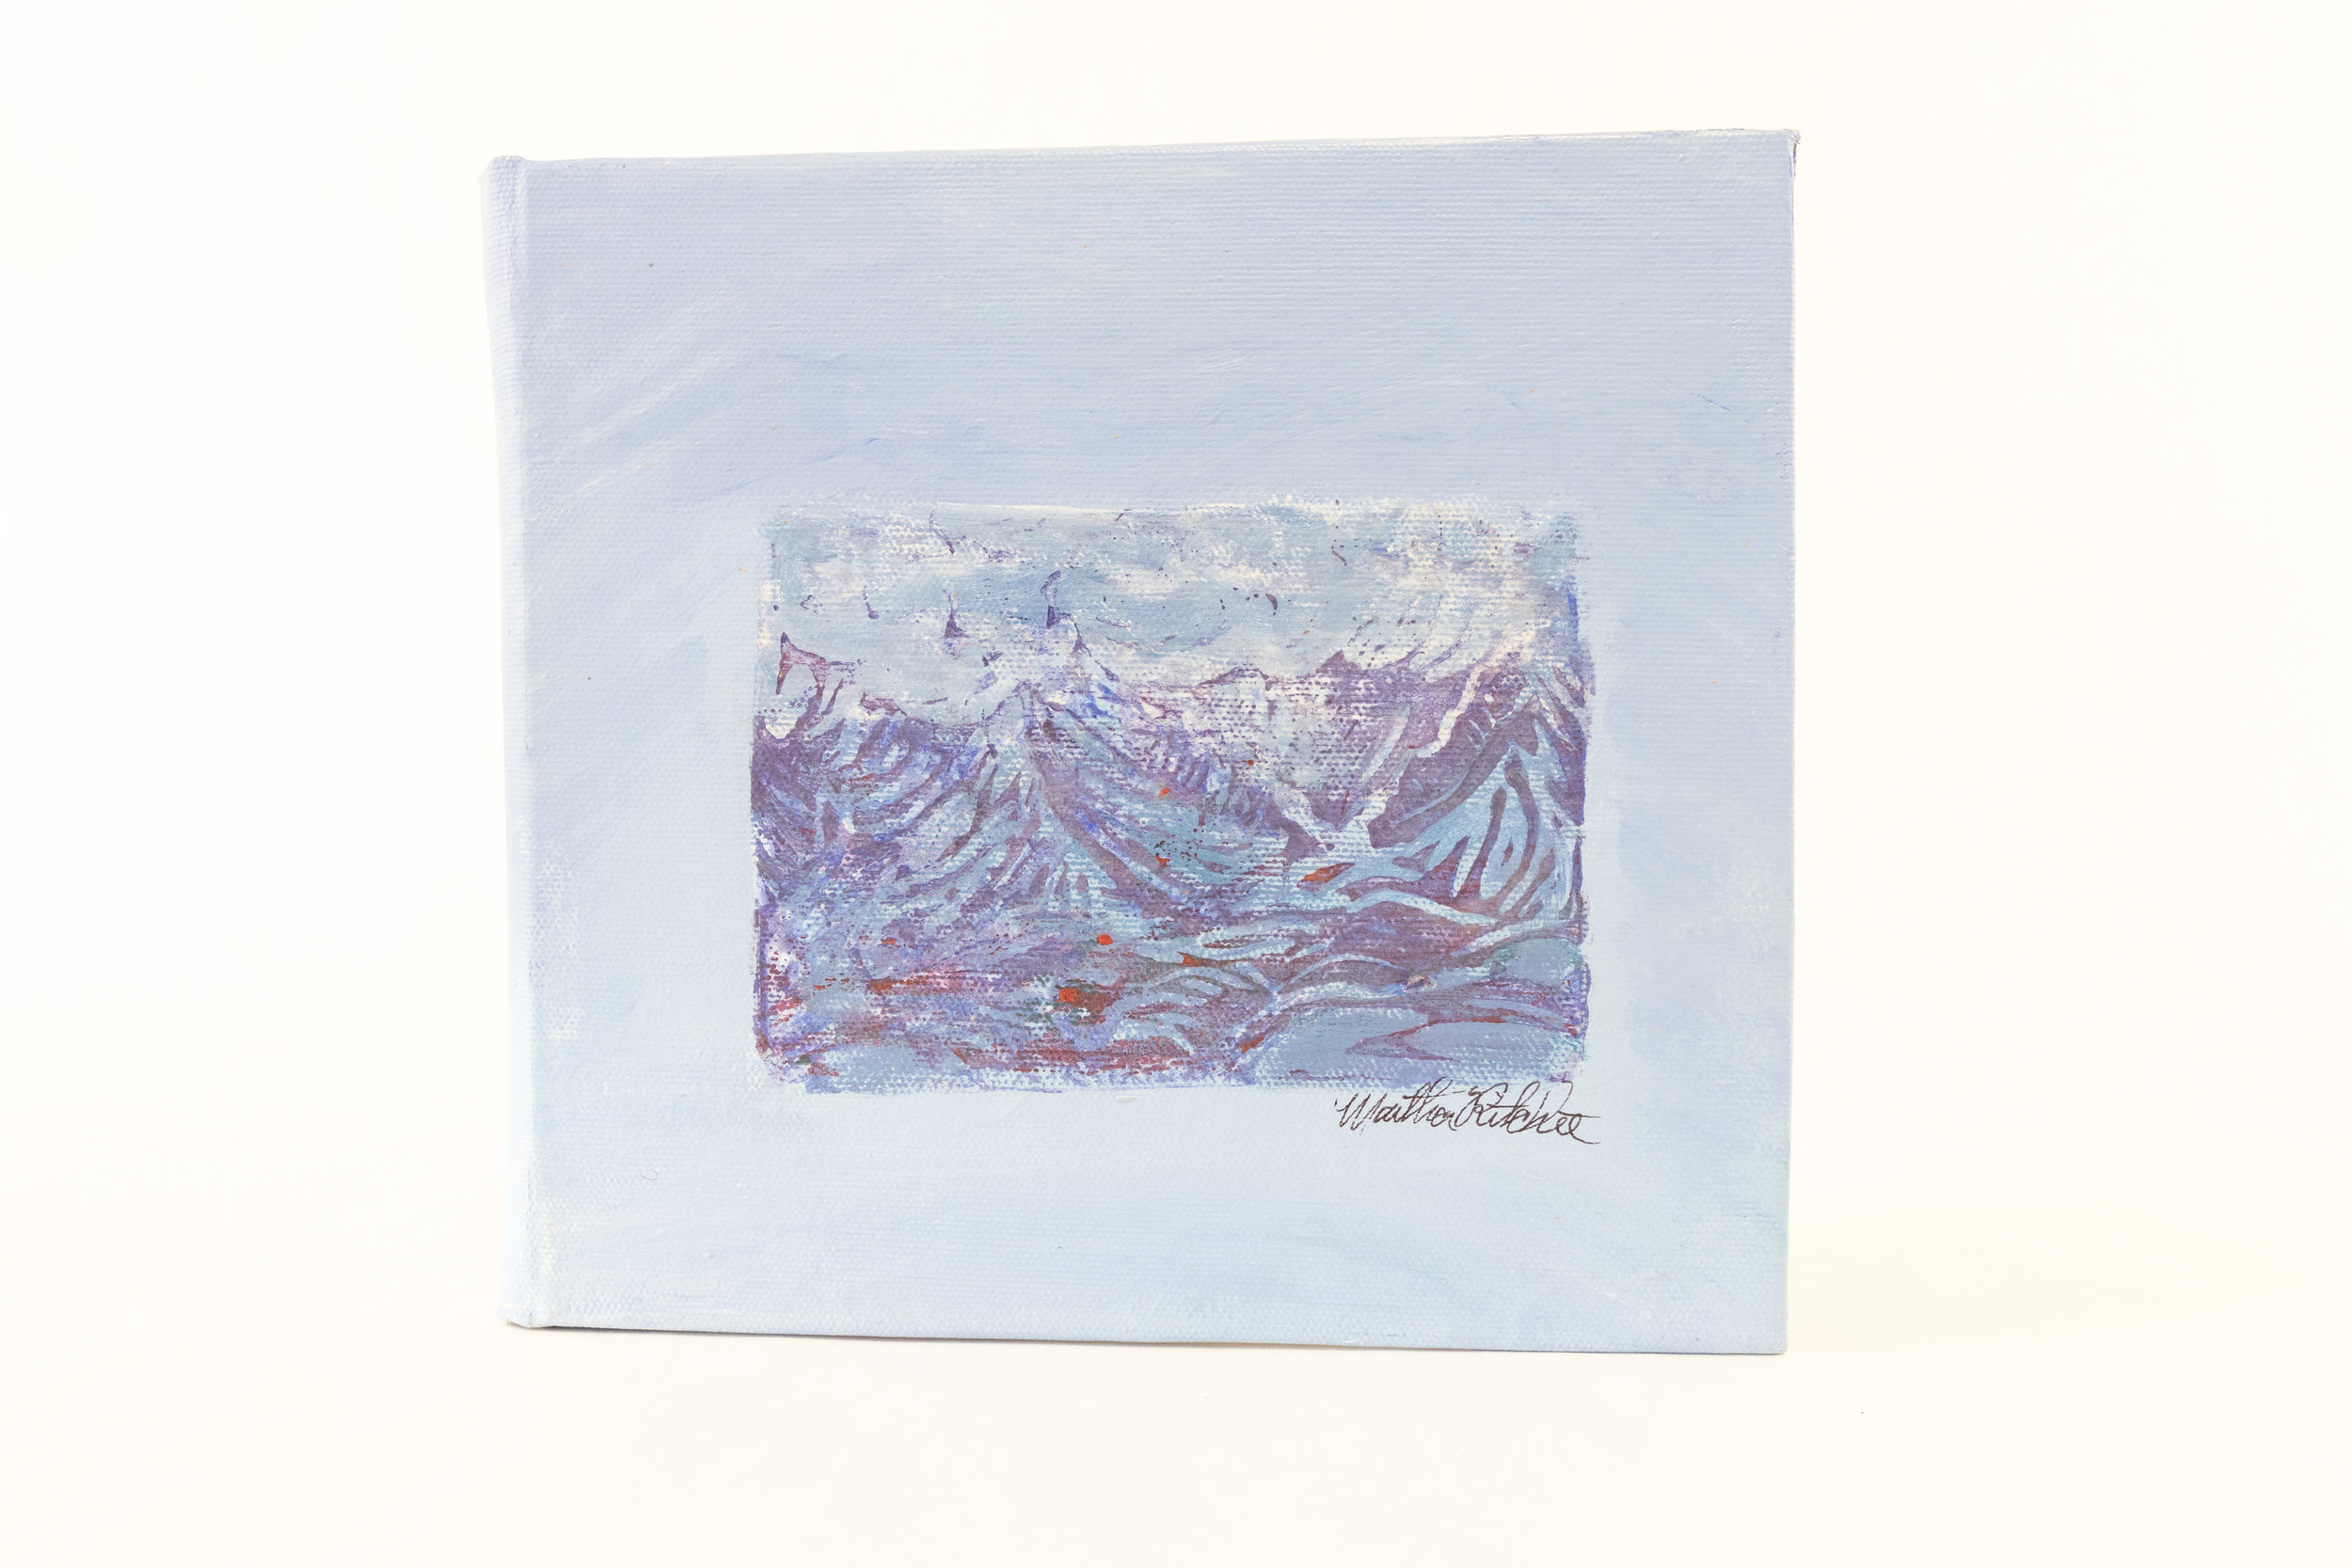 "Martha Jane Ritchie,""Tribute to Hokusai-36 Mountain Prints-Book II,"" Mixed Medium, Styrofoam prints on rag paper, 2016, $120, Haines Jct, Canada"